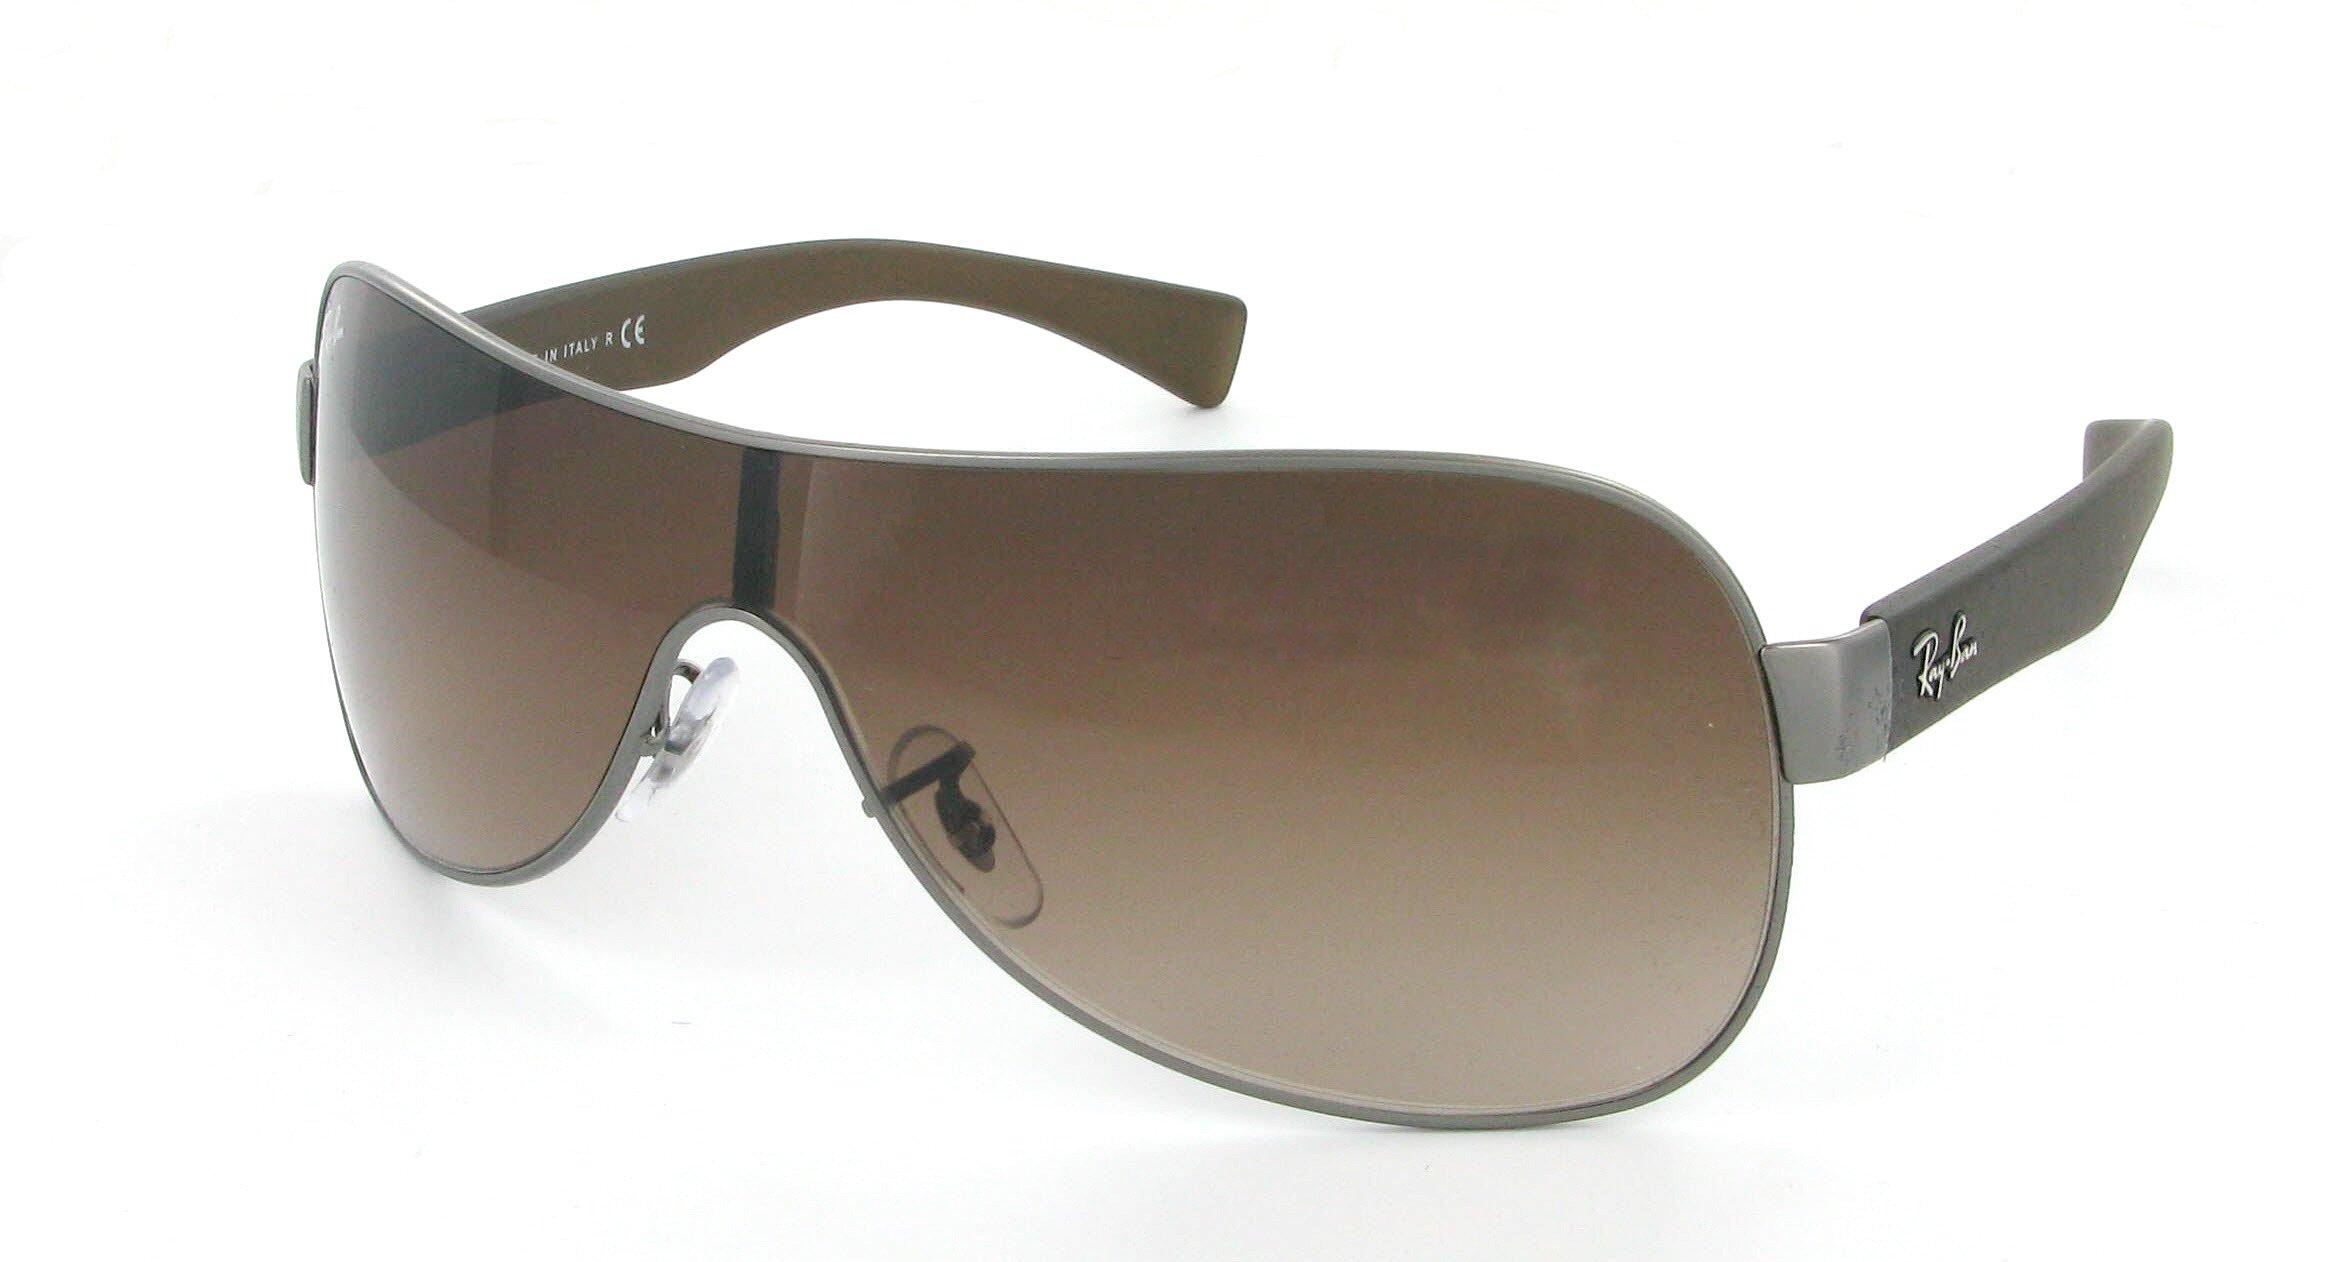 lunettes de soleil ray ban rb 3471 029 13 99 32 mixte gun. Black Bedroom Furniture Sets. Home Design Ideas